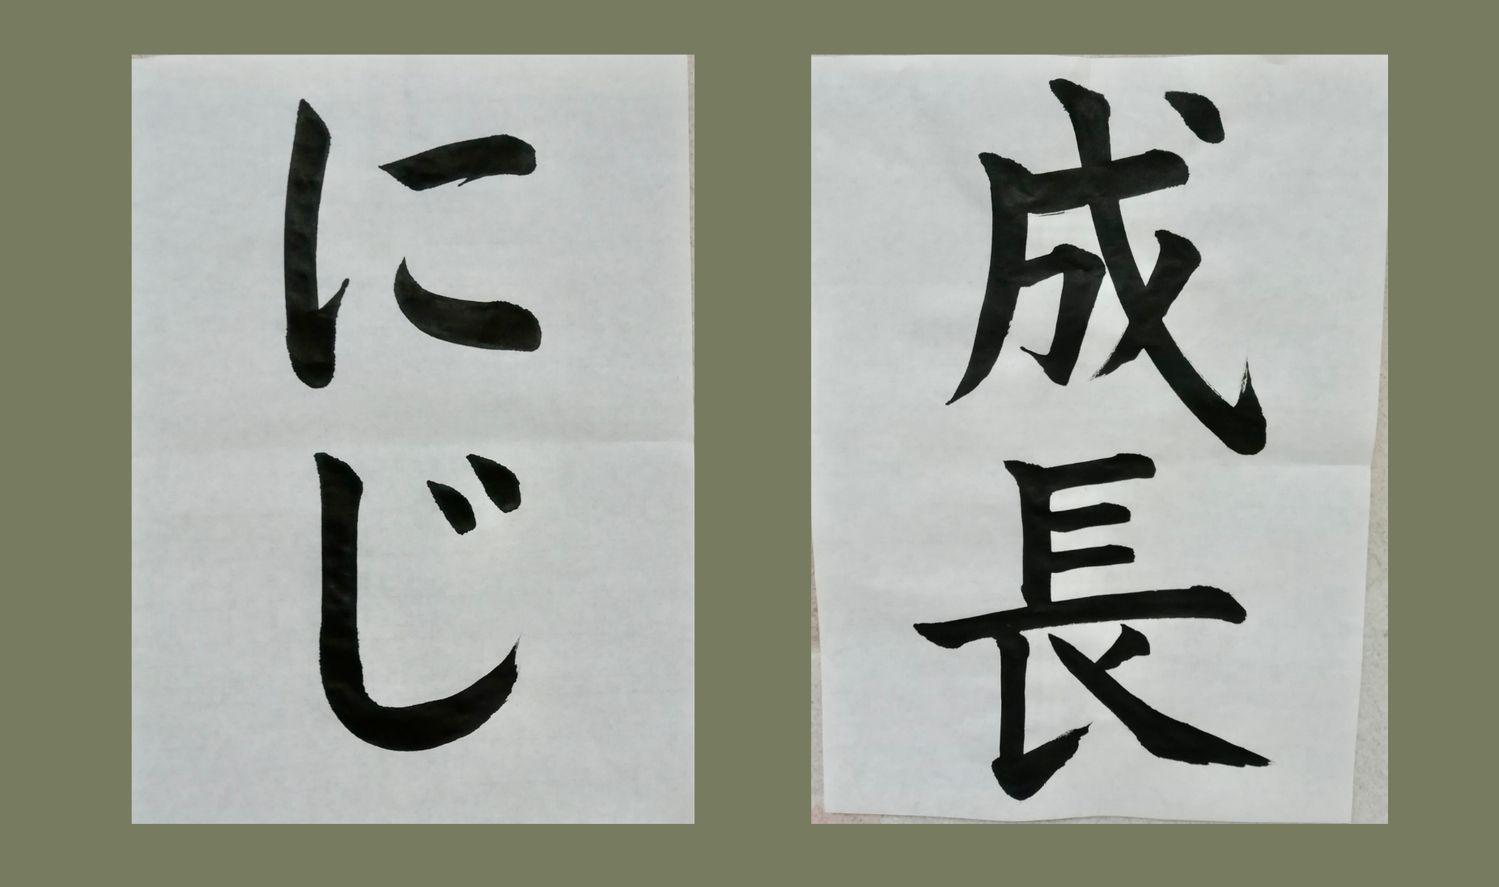 尾崎 美和子